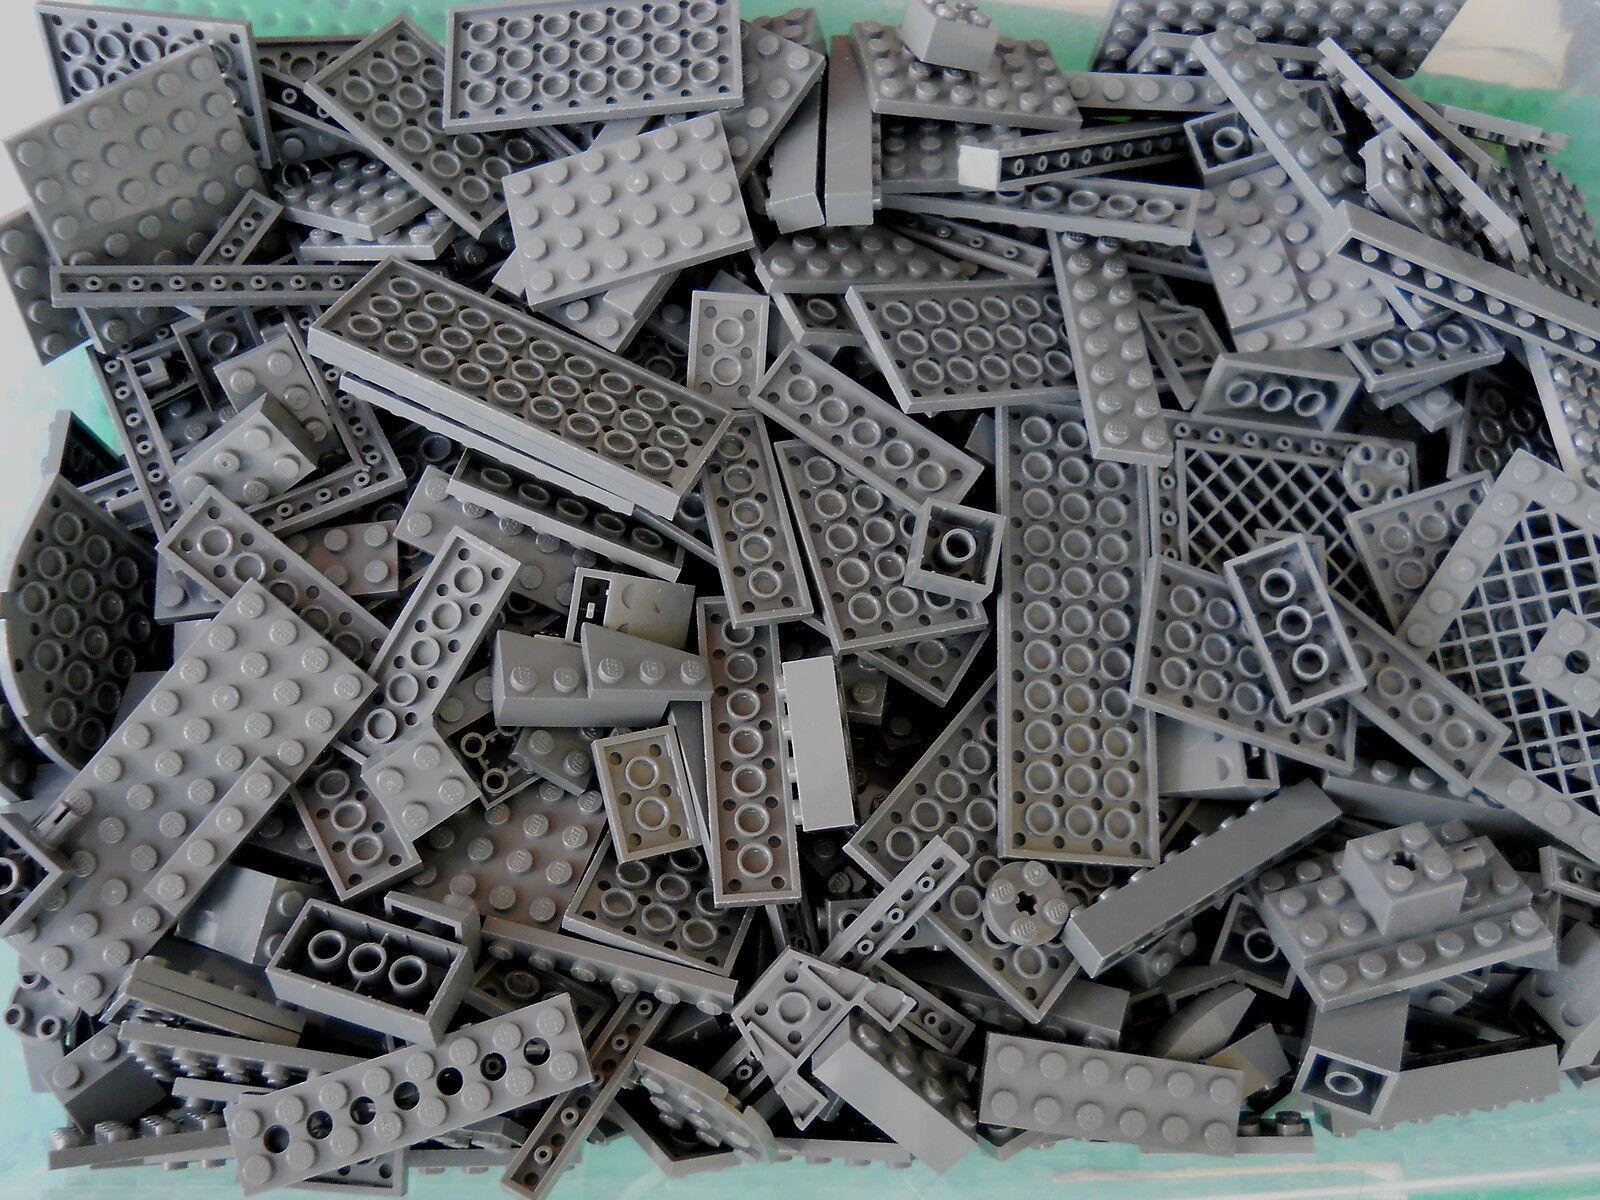 LEGO DARK BLUE GRAY 1//4 lb Bulk Lot of Bricks Plates Specialty Parts Pieces